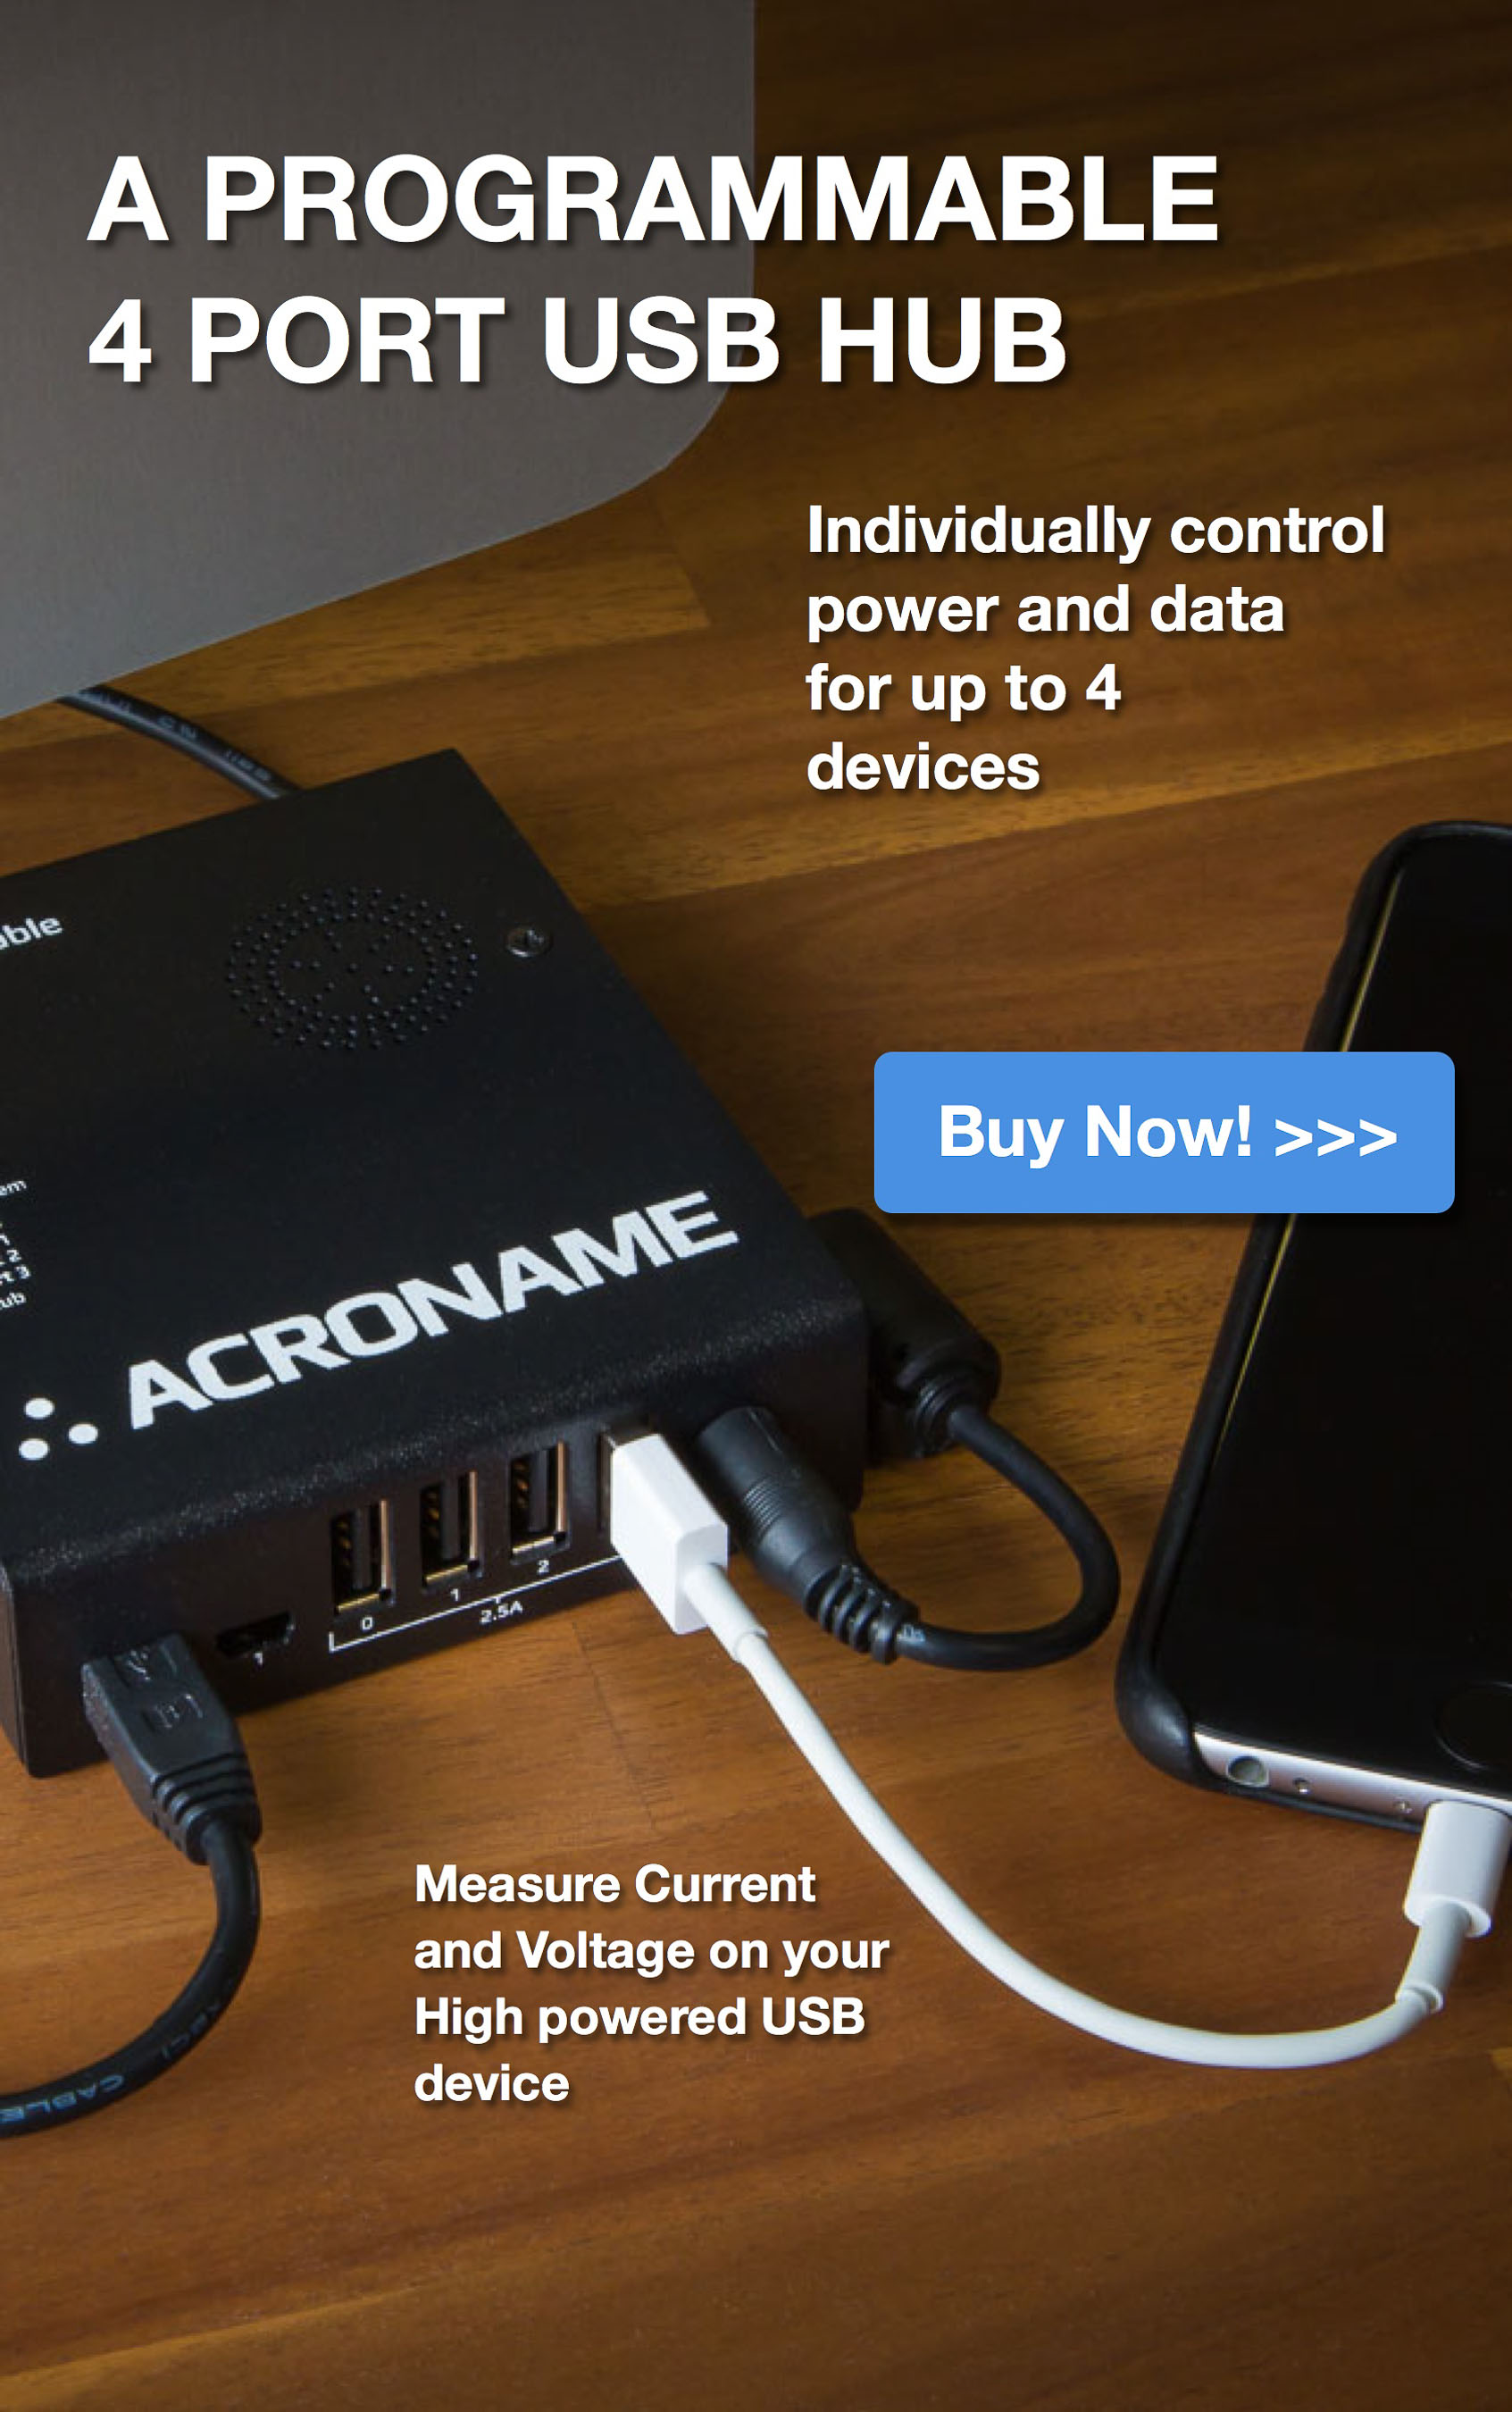 Acroname Programmable Industrial 4 port USB Hub